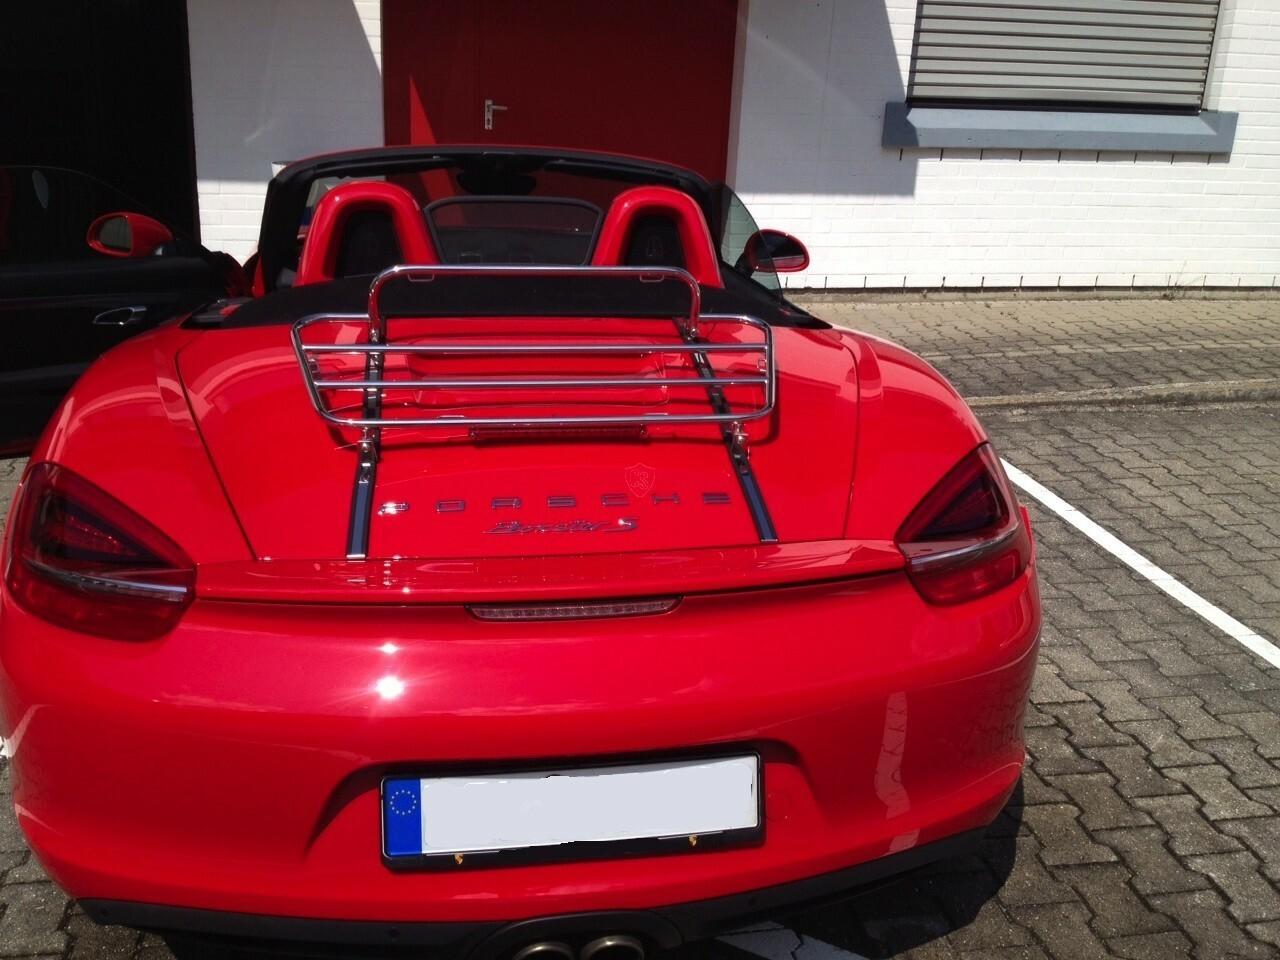 Porsche Boxster 981 Luggage Rack 2012 2016 Cabrio Supply